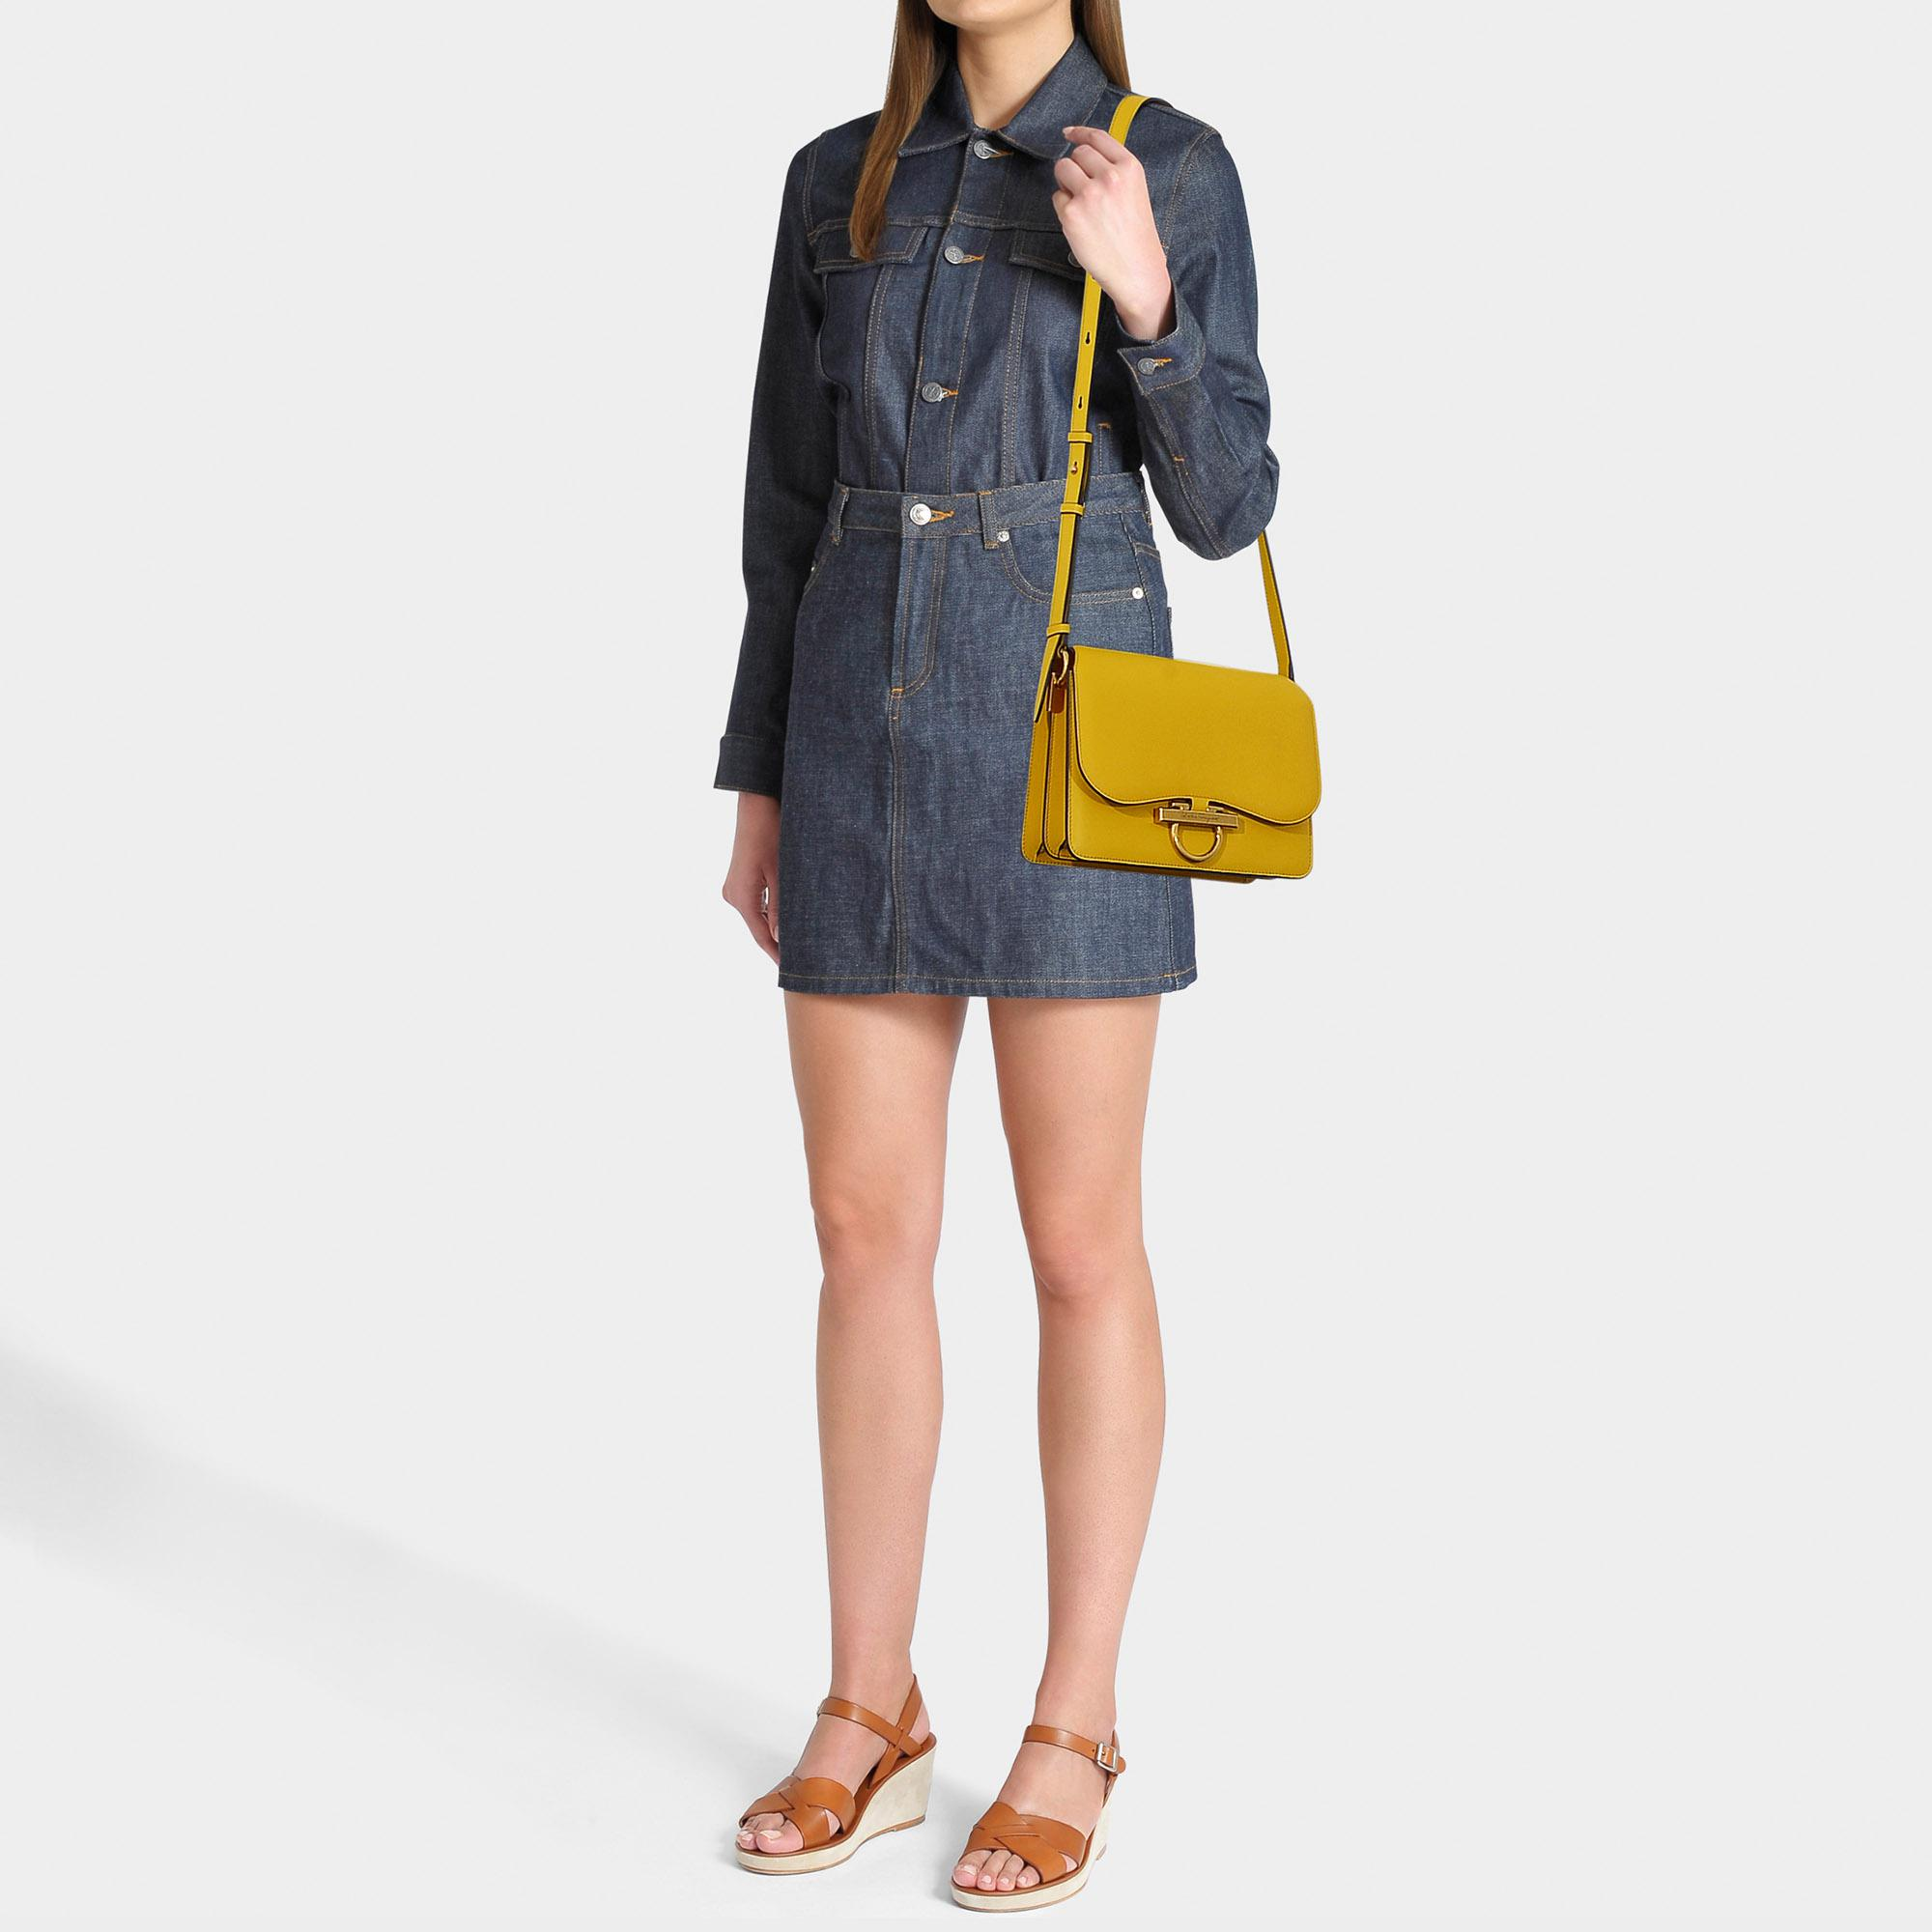 17e6002319 Lyst - Ferragamo Joanne Flap Bag In Yellow Calfskin in Yellow - Save 4%